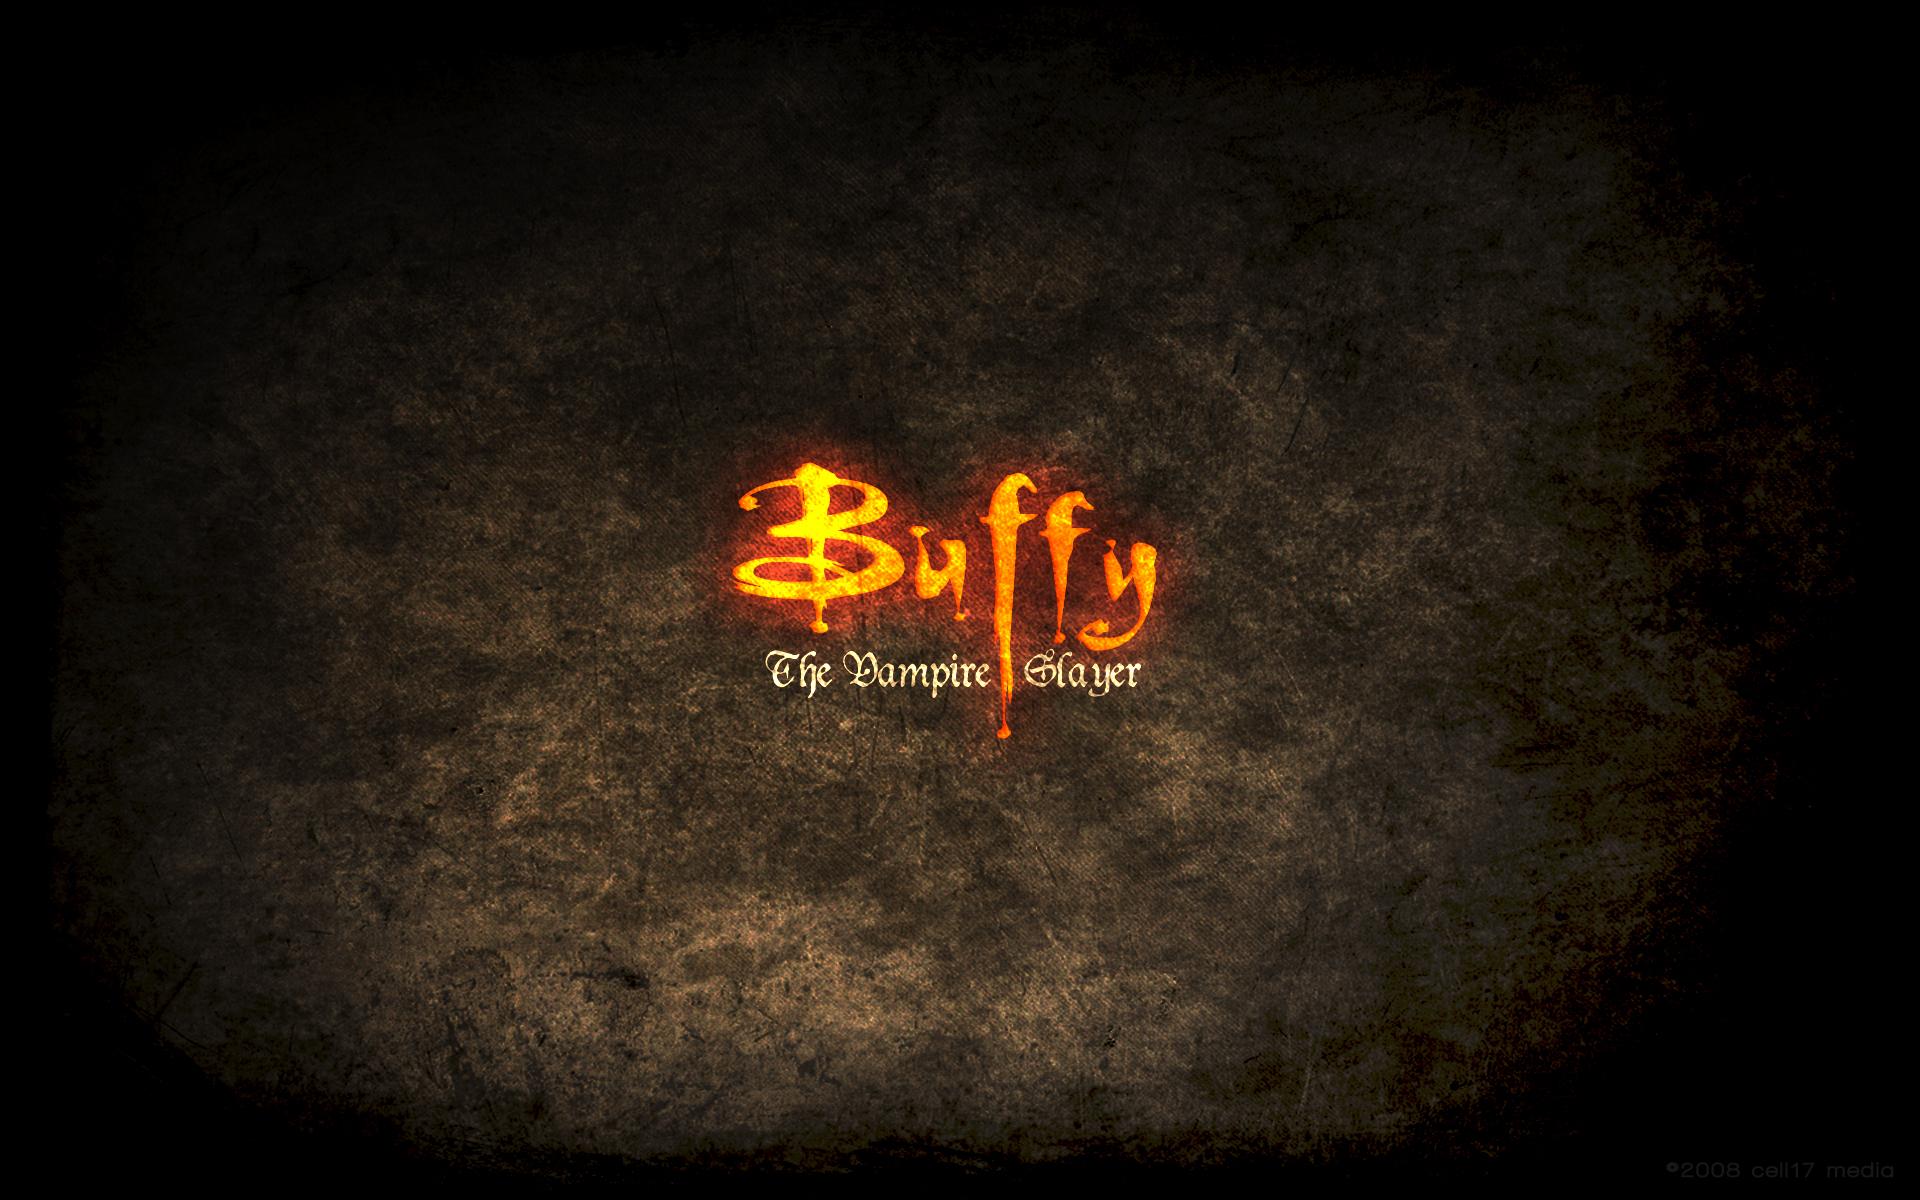 Buffy The Vampire Slayer Computer Wallpapers Desktop Backgrounds 1920x1200